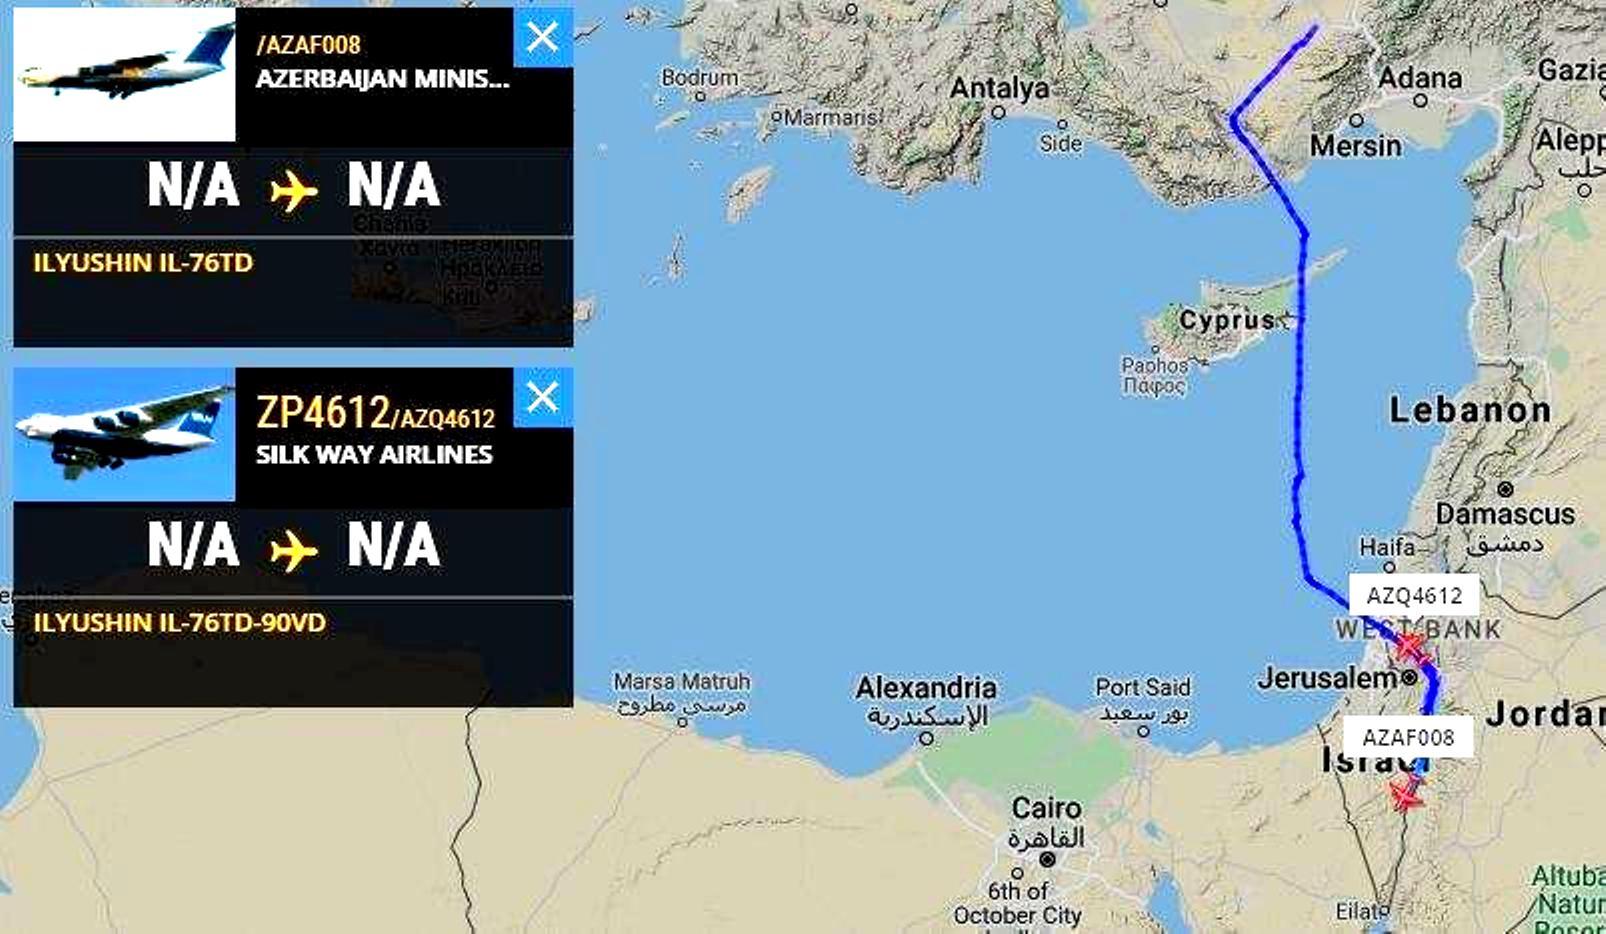 Haaretz: Περίεργη Συμμαχία Ισραήλ και Τουρκίας στο Ναγκόρνο-Καραμπάχ.